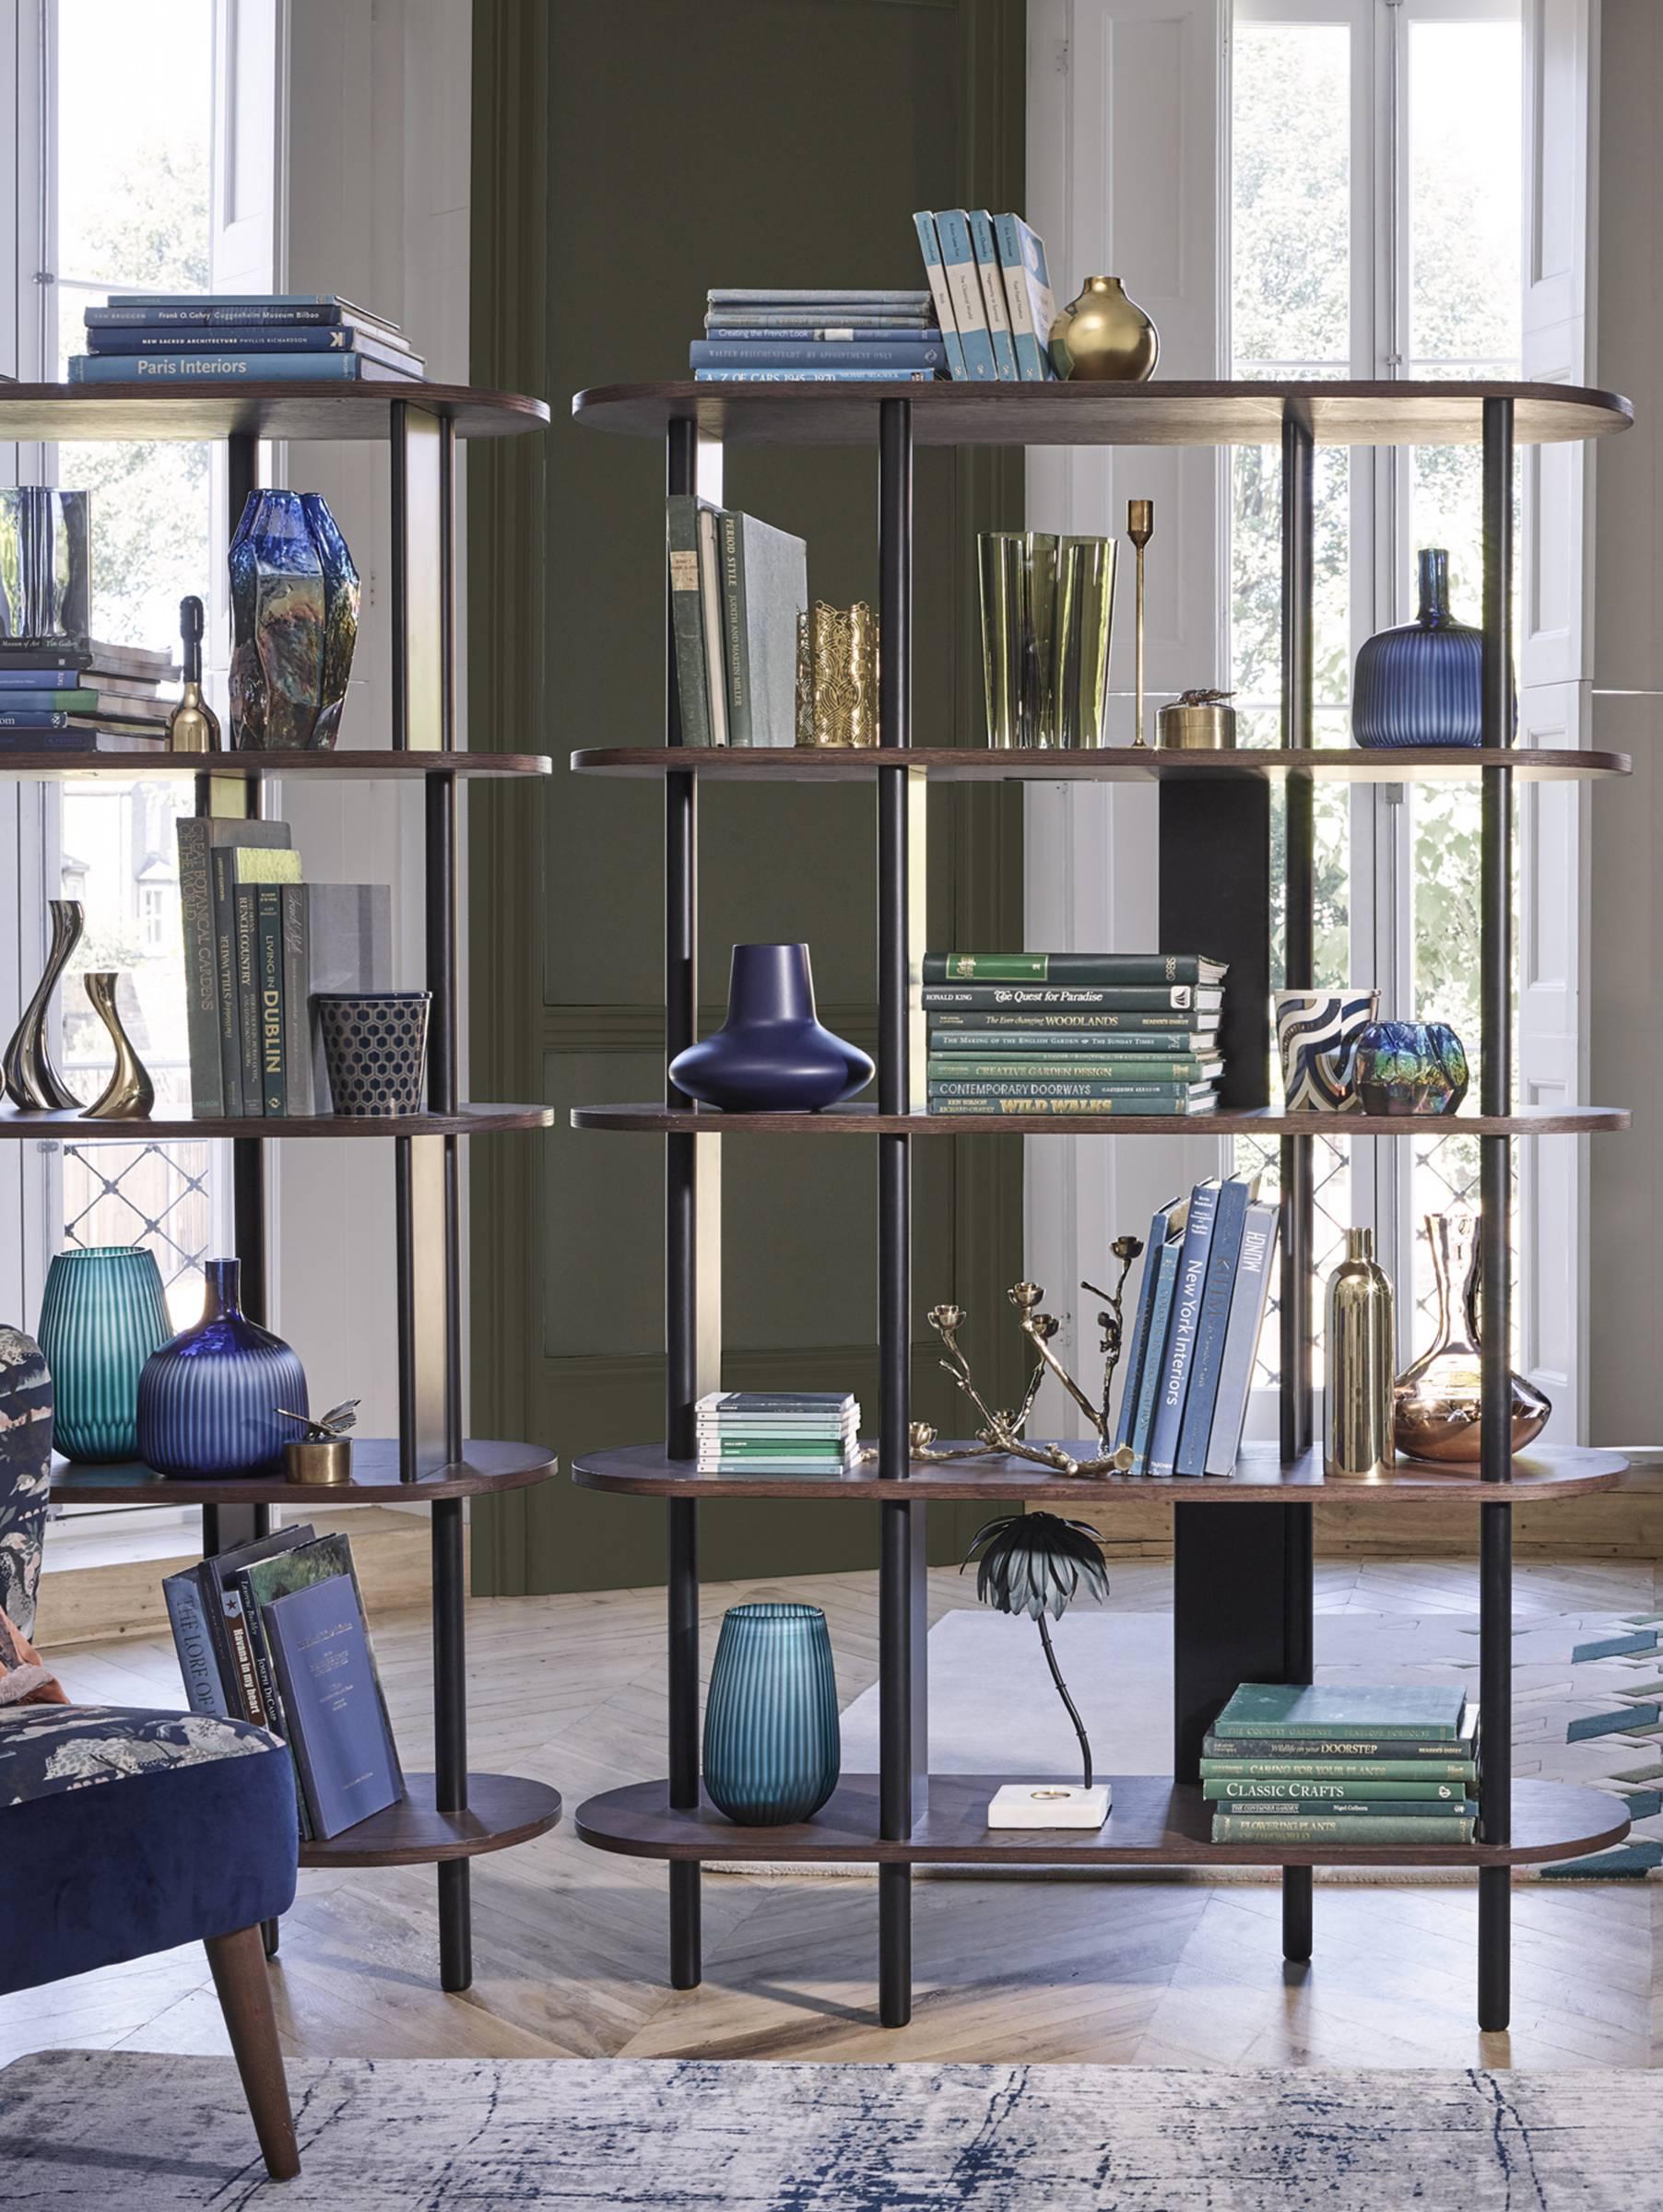 Bookcases shelves